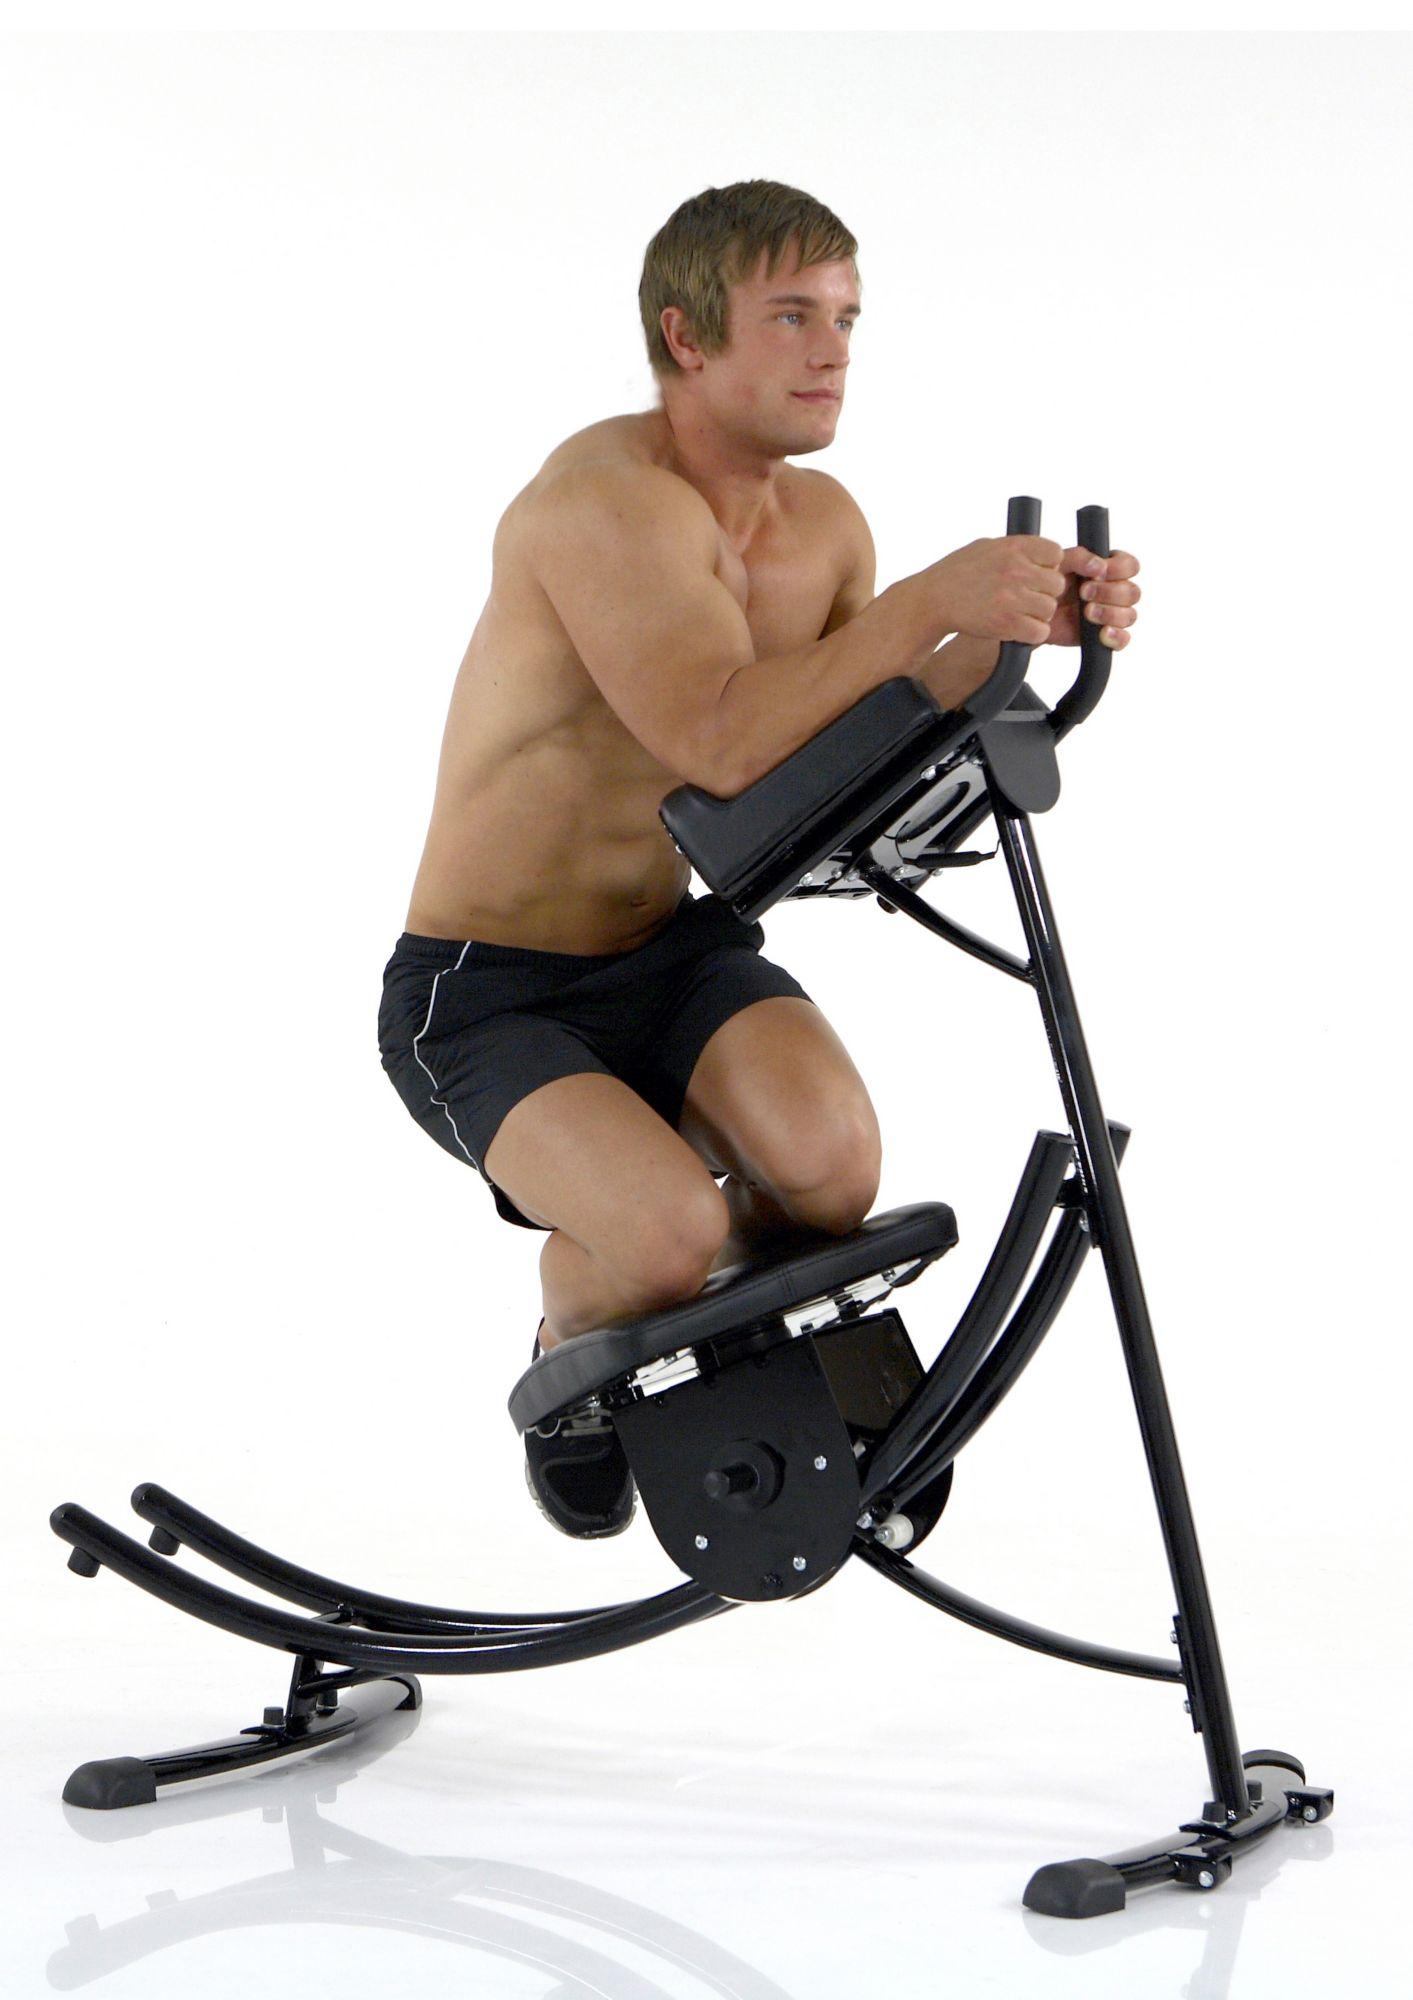 MENS HEALTH POWERTOOLS Bauchtrainer, »AB-Trax Pro«, Mens Health Powertools